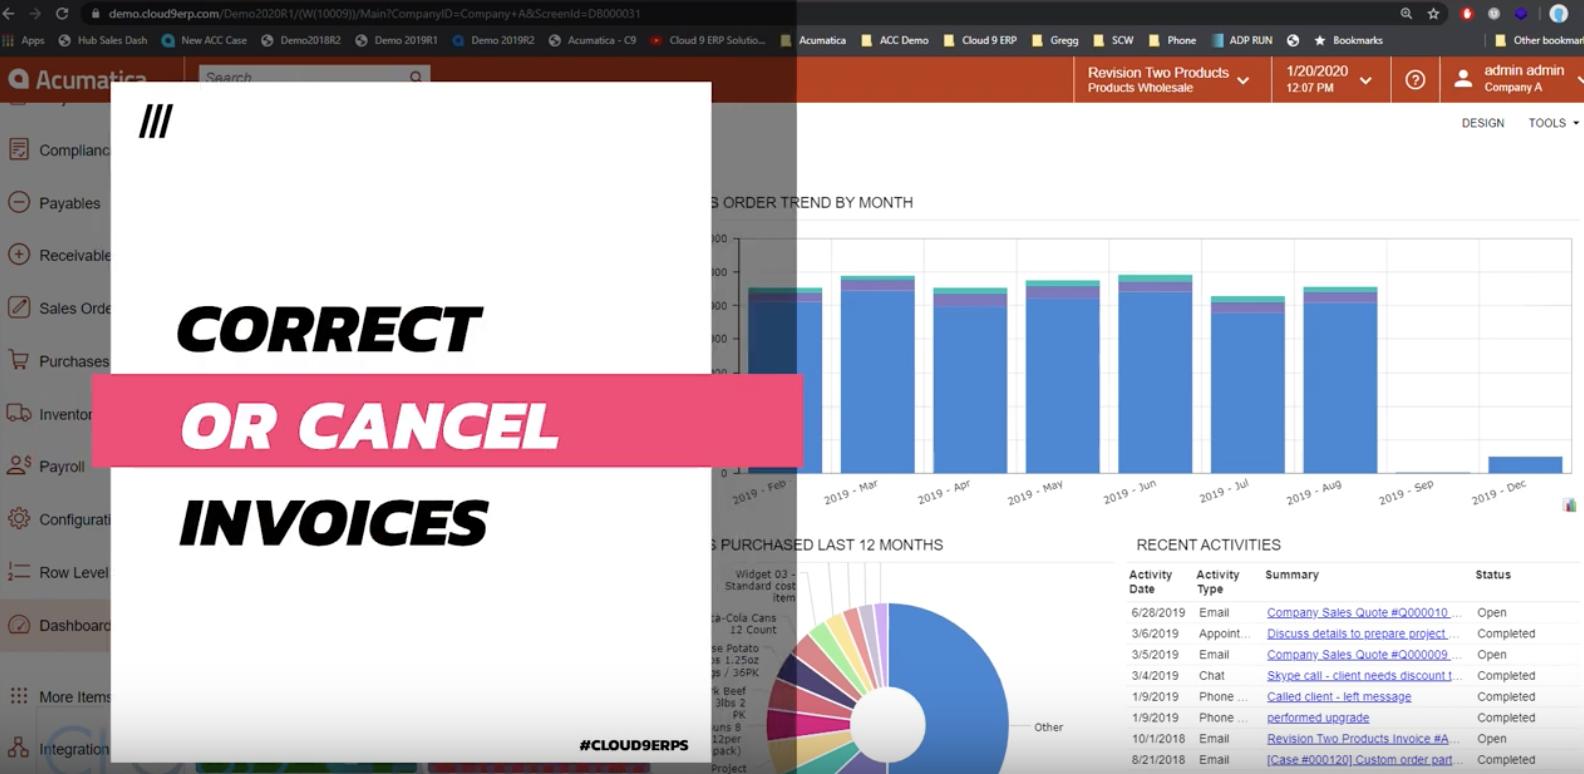 Acumatica-2020-R1-Cancel-and-Correct-Invoices